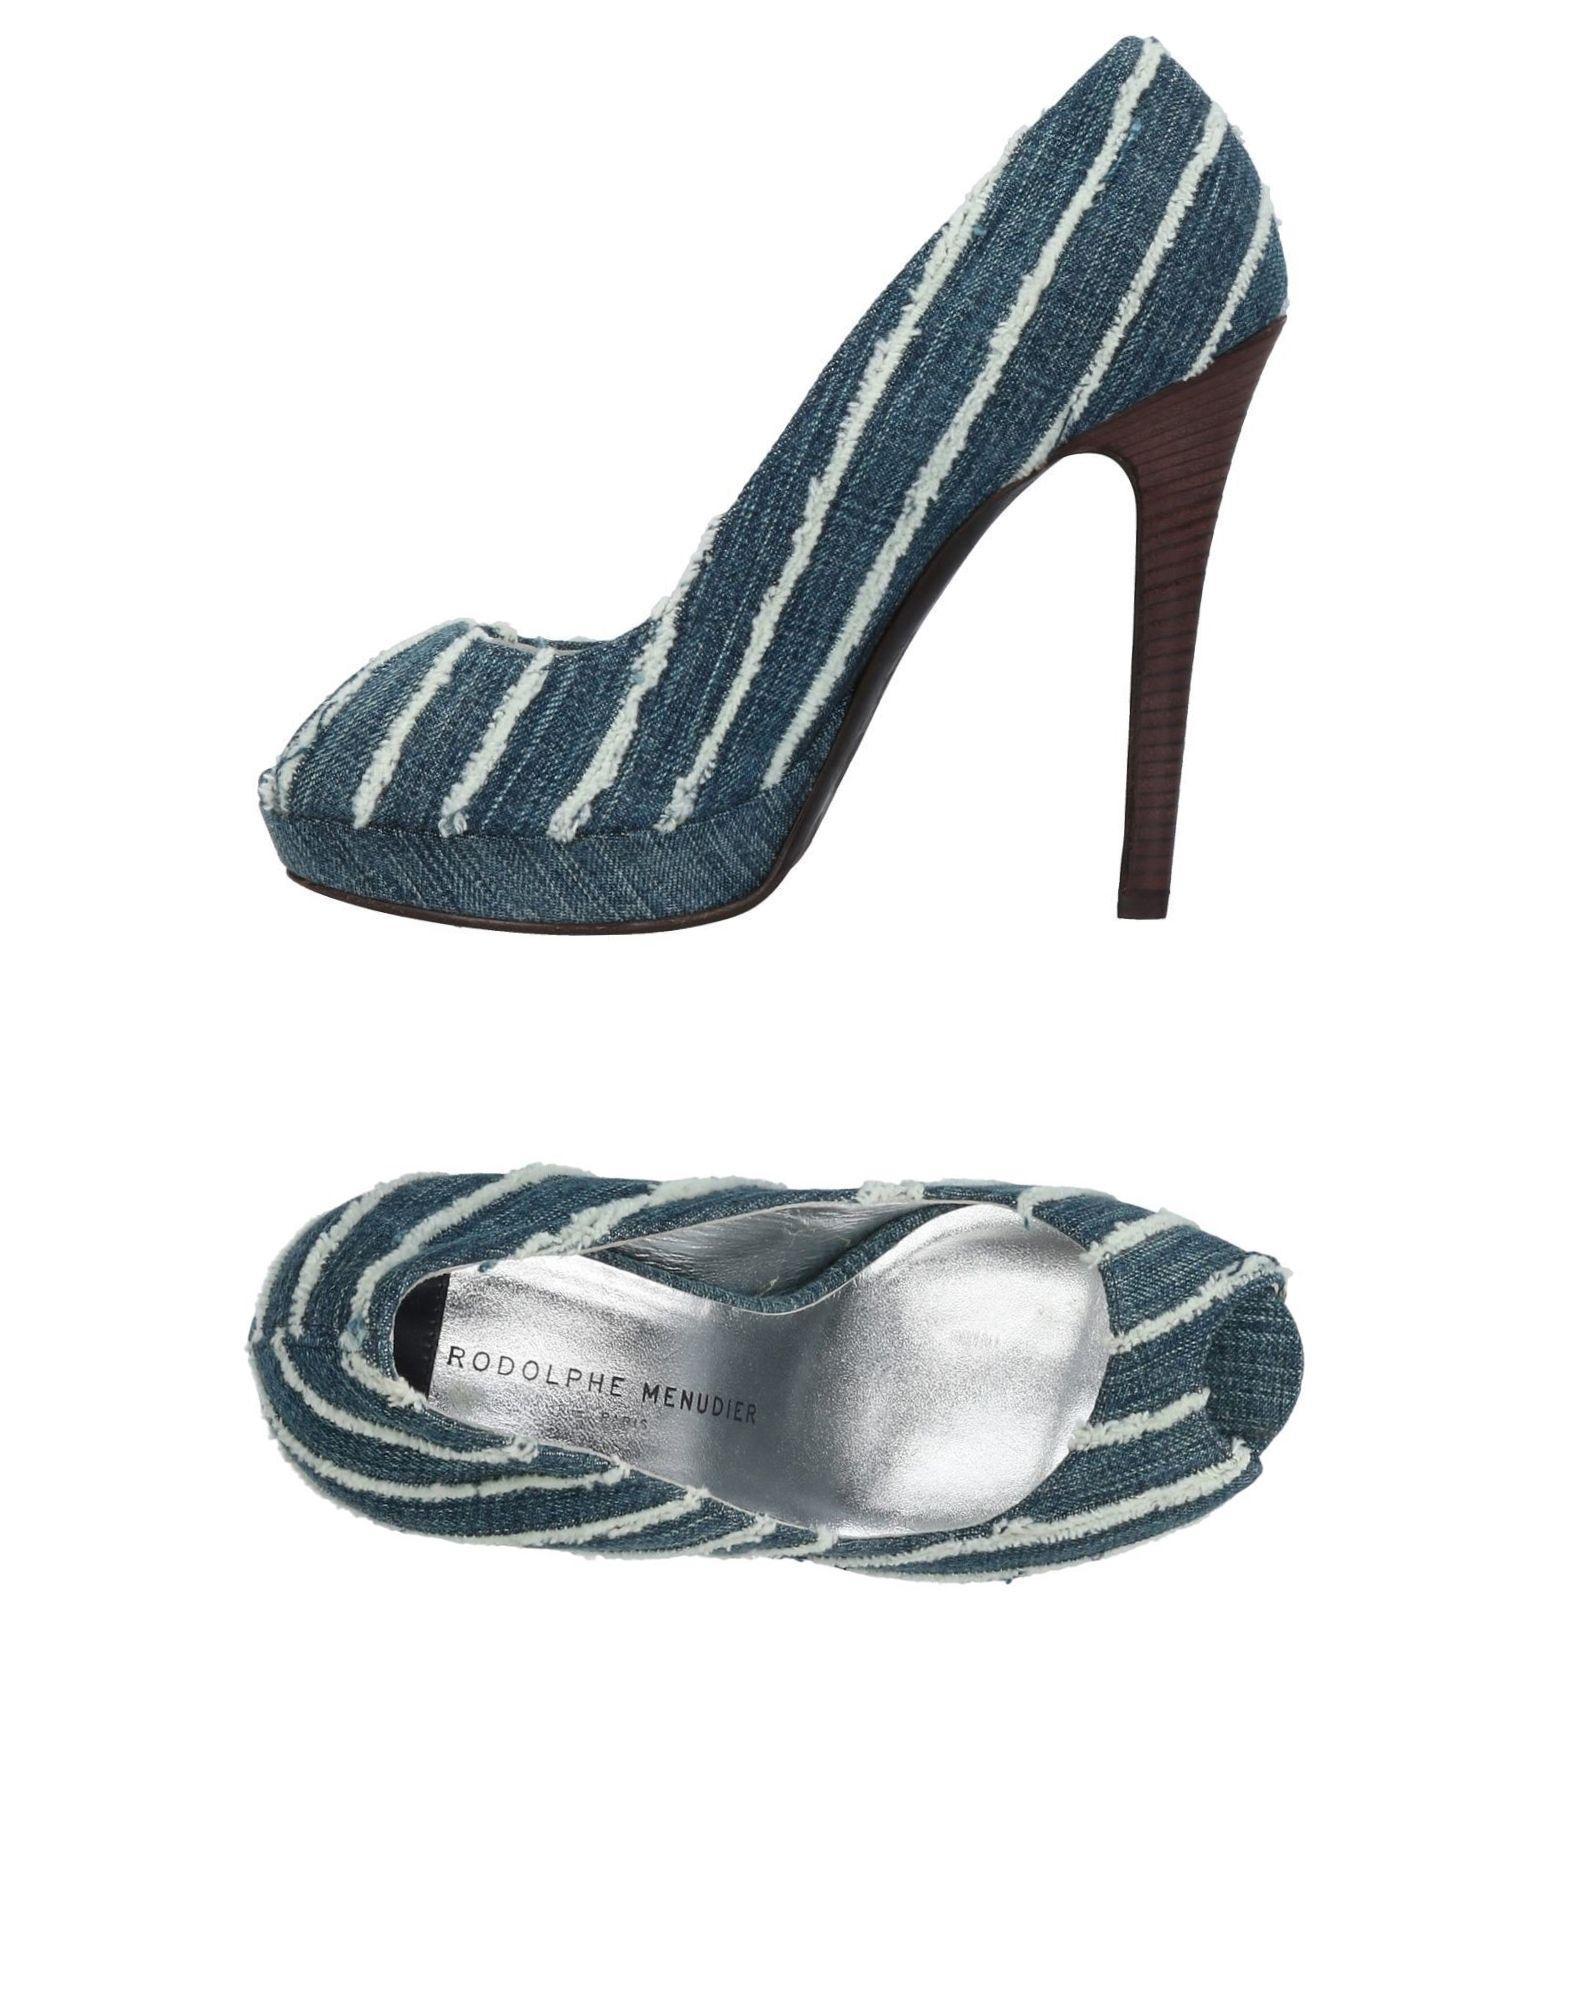 FOOTWEAR - Loafers on YOOX.COM RODOLPHE MENUDIER oahRhZk5Y